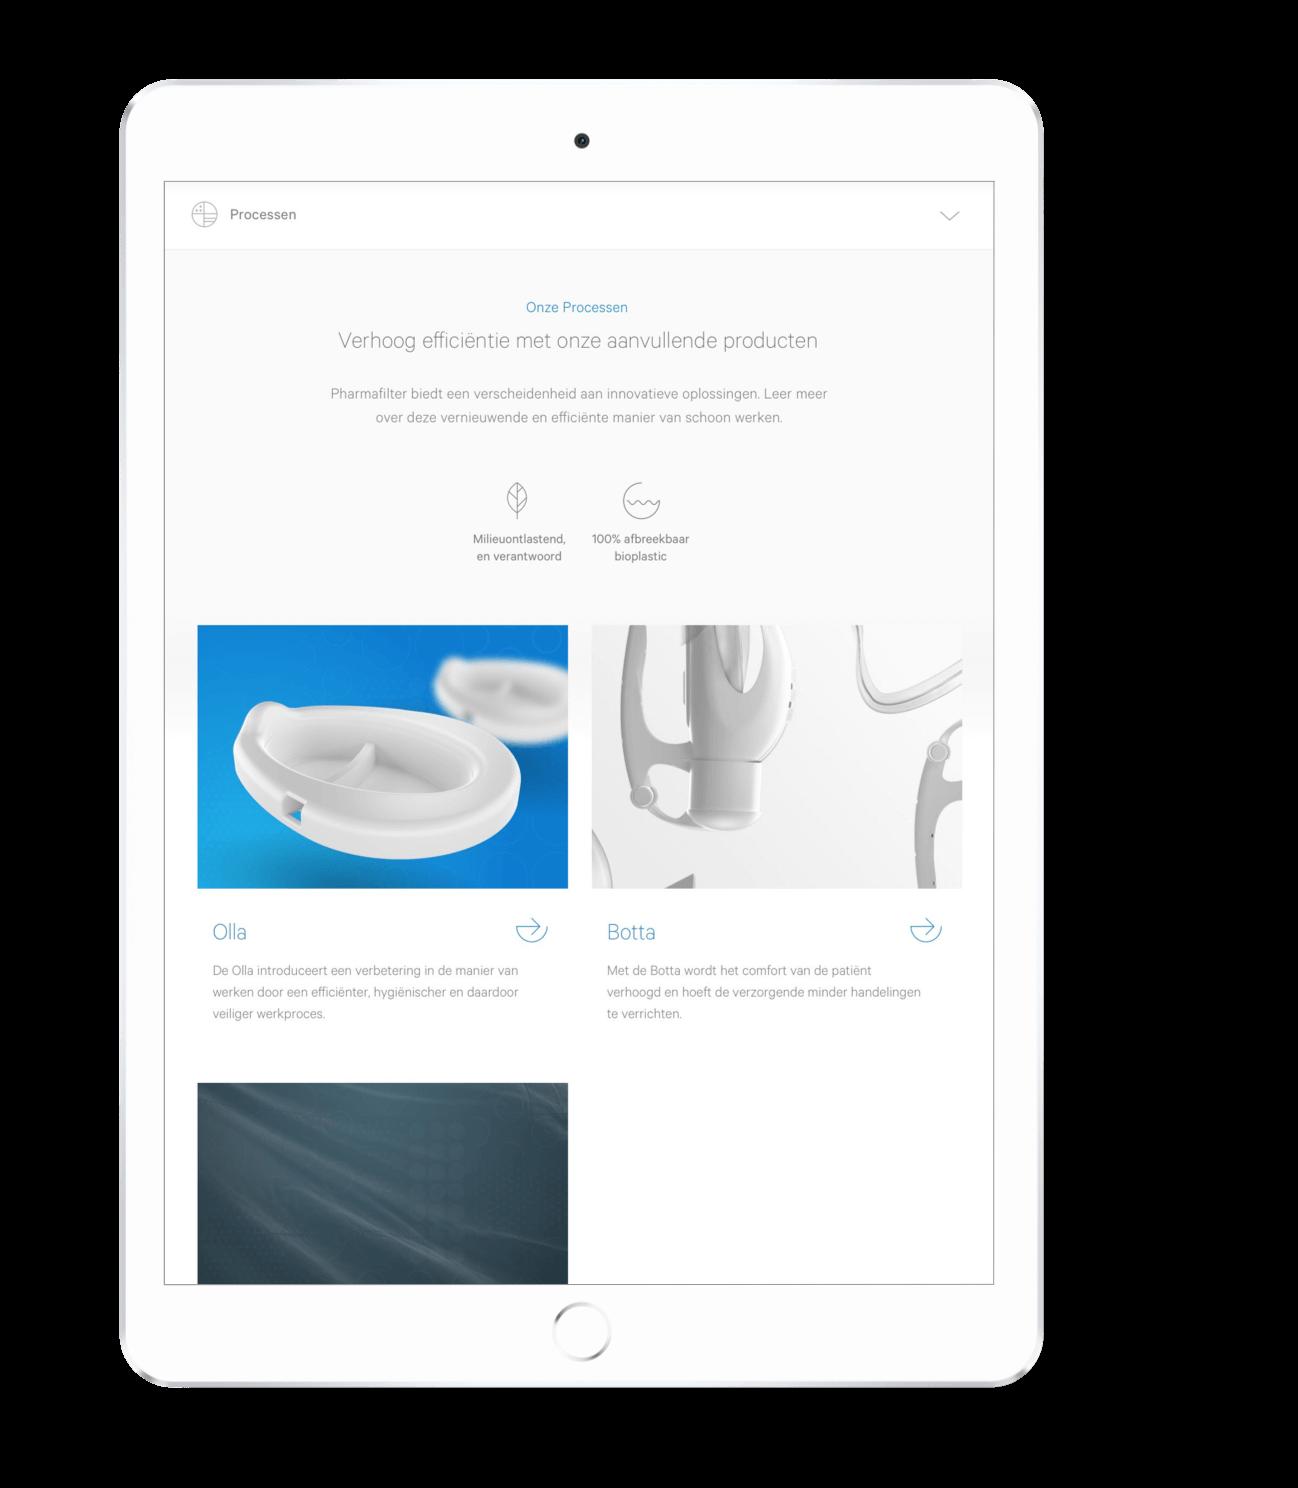 Pharmafilter product pagina overzicht ontwerp op tablet